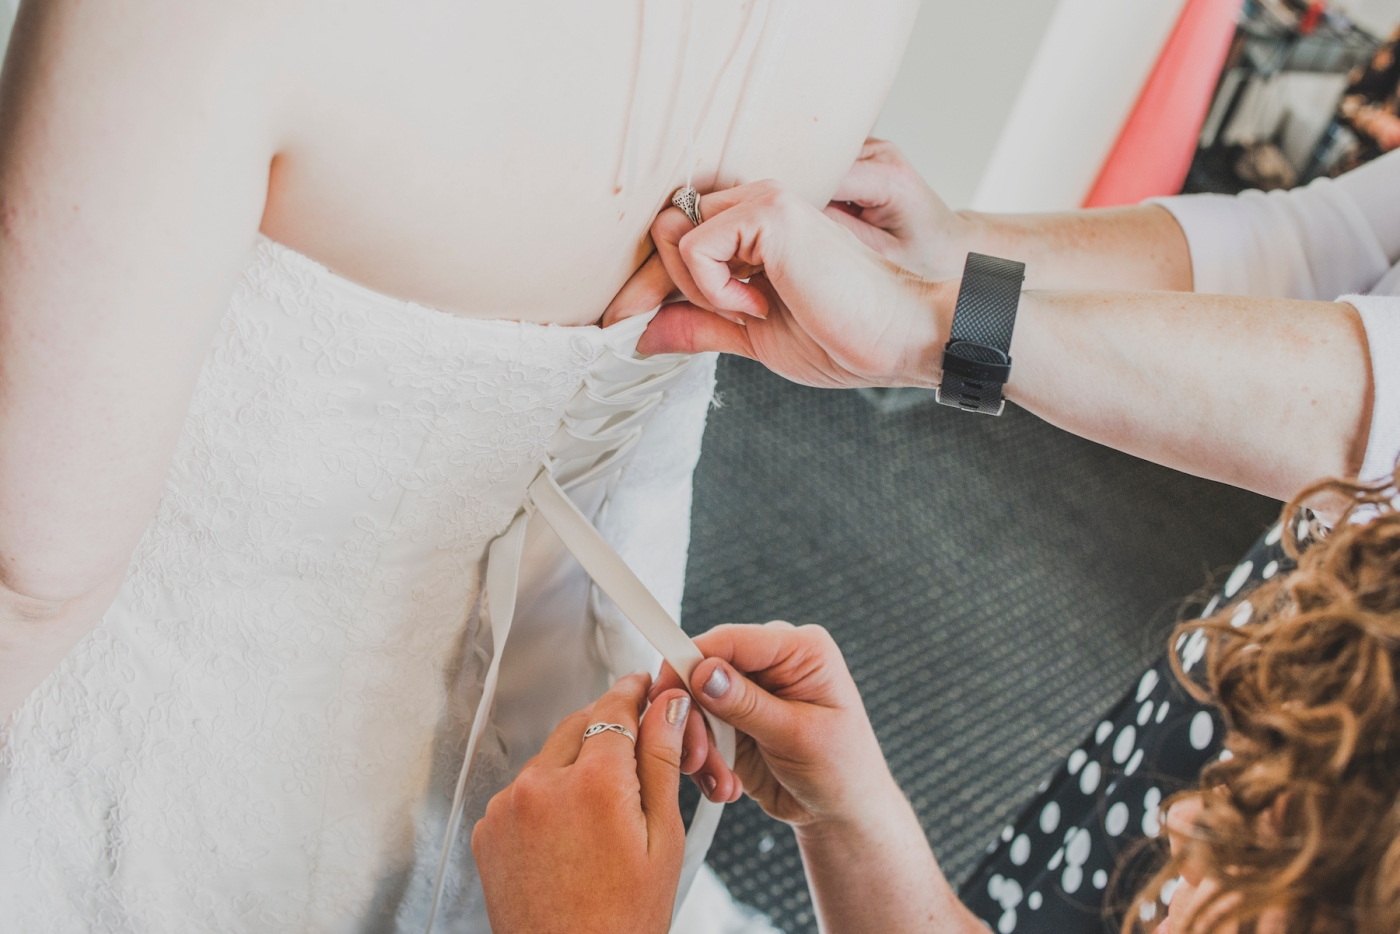 DSC_1869Everett_Wedding_Ballroom_Jane_Speleers_photography_Rachel_and_Edmund_Getting_ready_2017